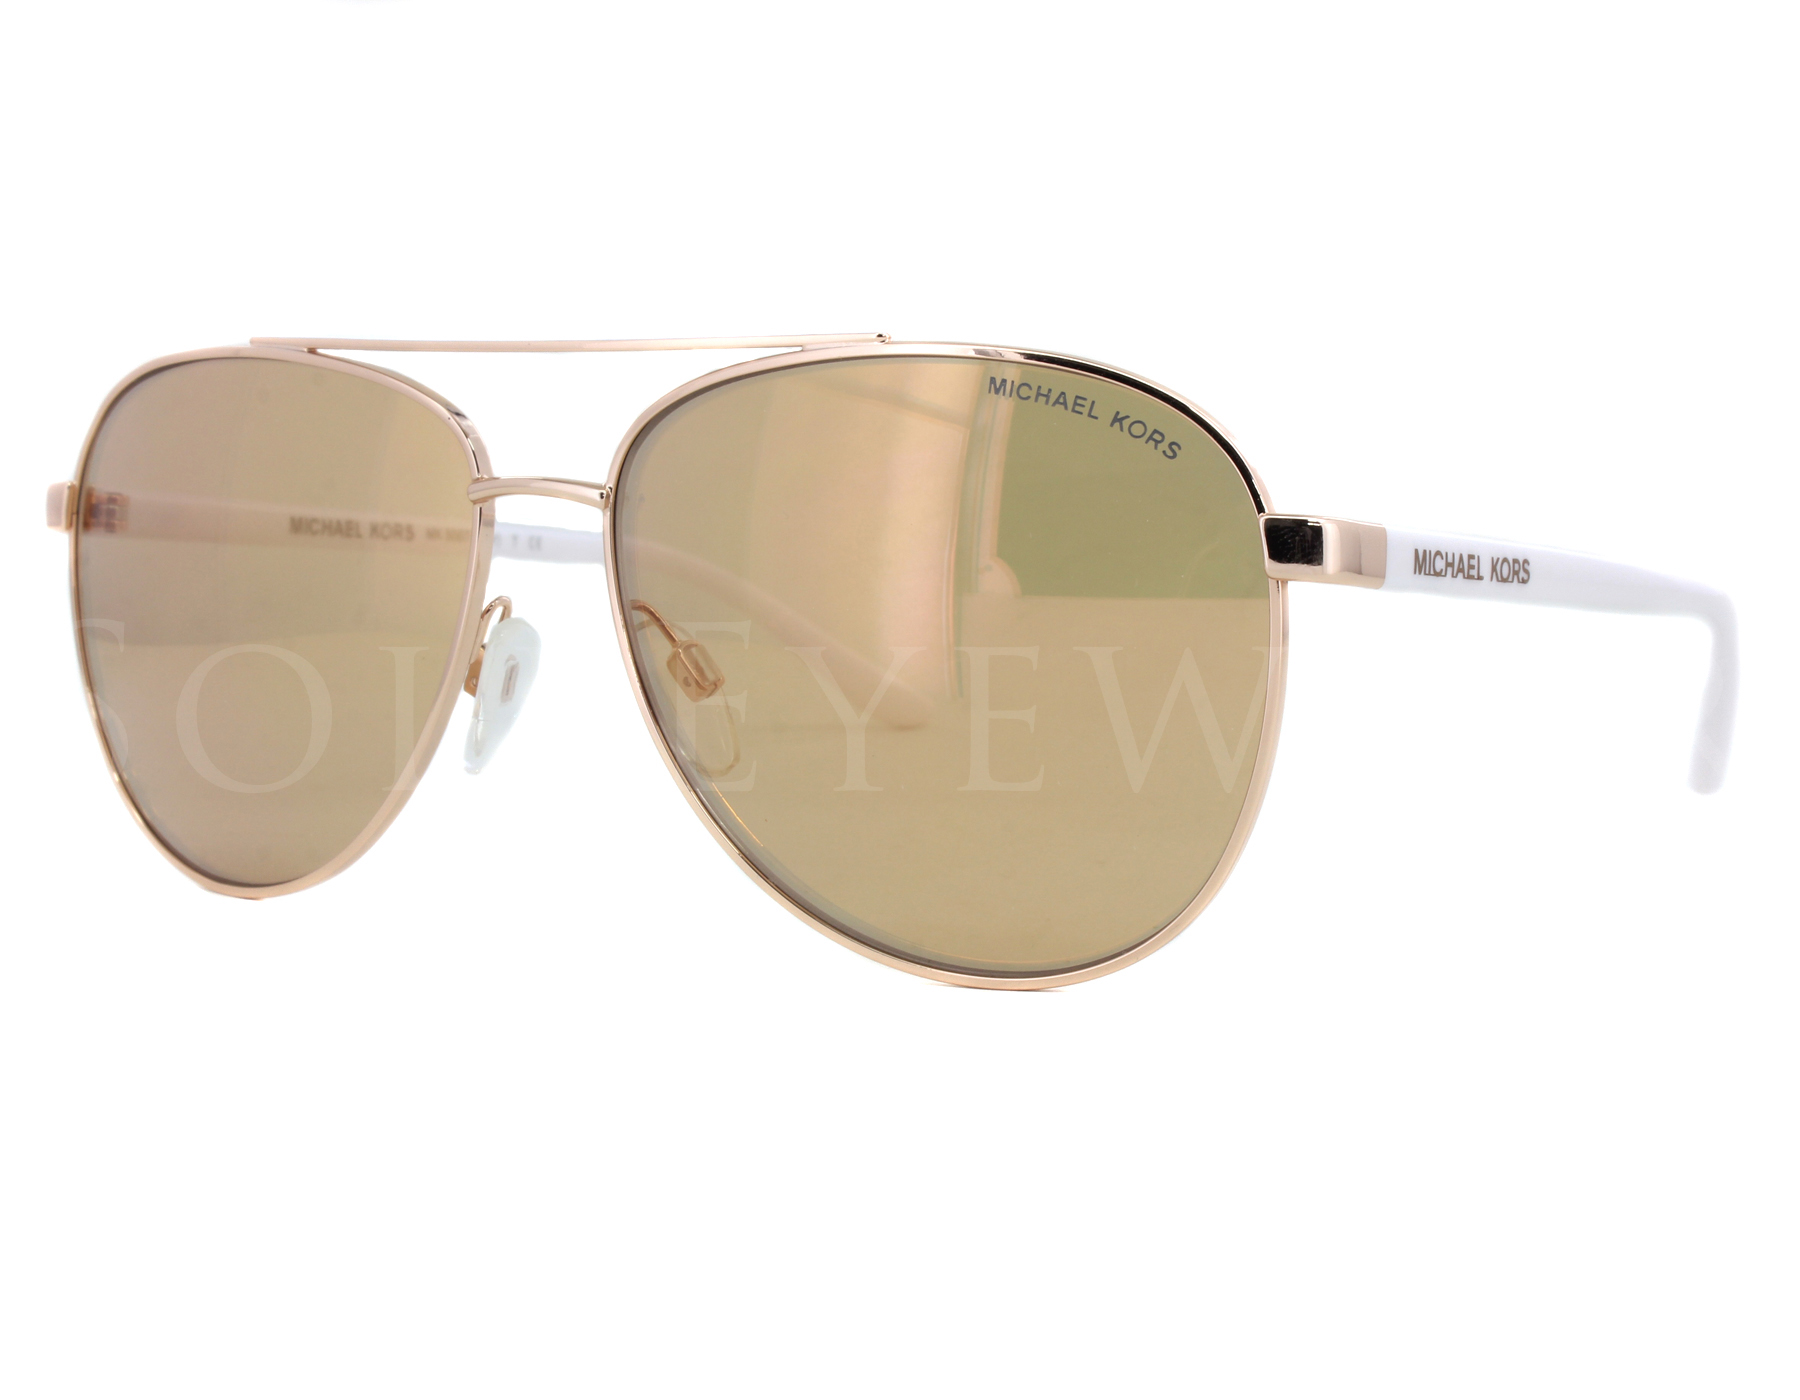 cacf27c011 Details about NEW Michael Kors MK5007 1080R1 59 Rose Gold   Rose Gold Flash  Sunglasses